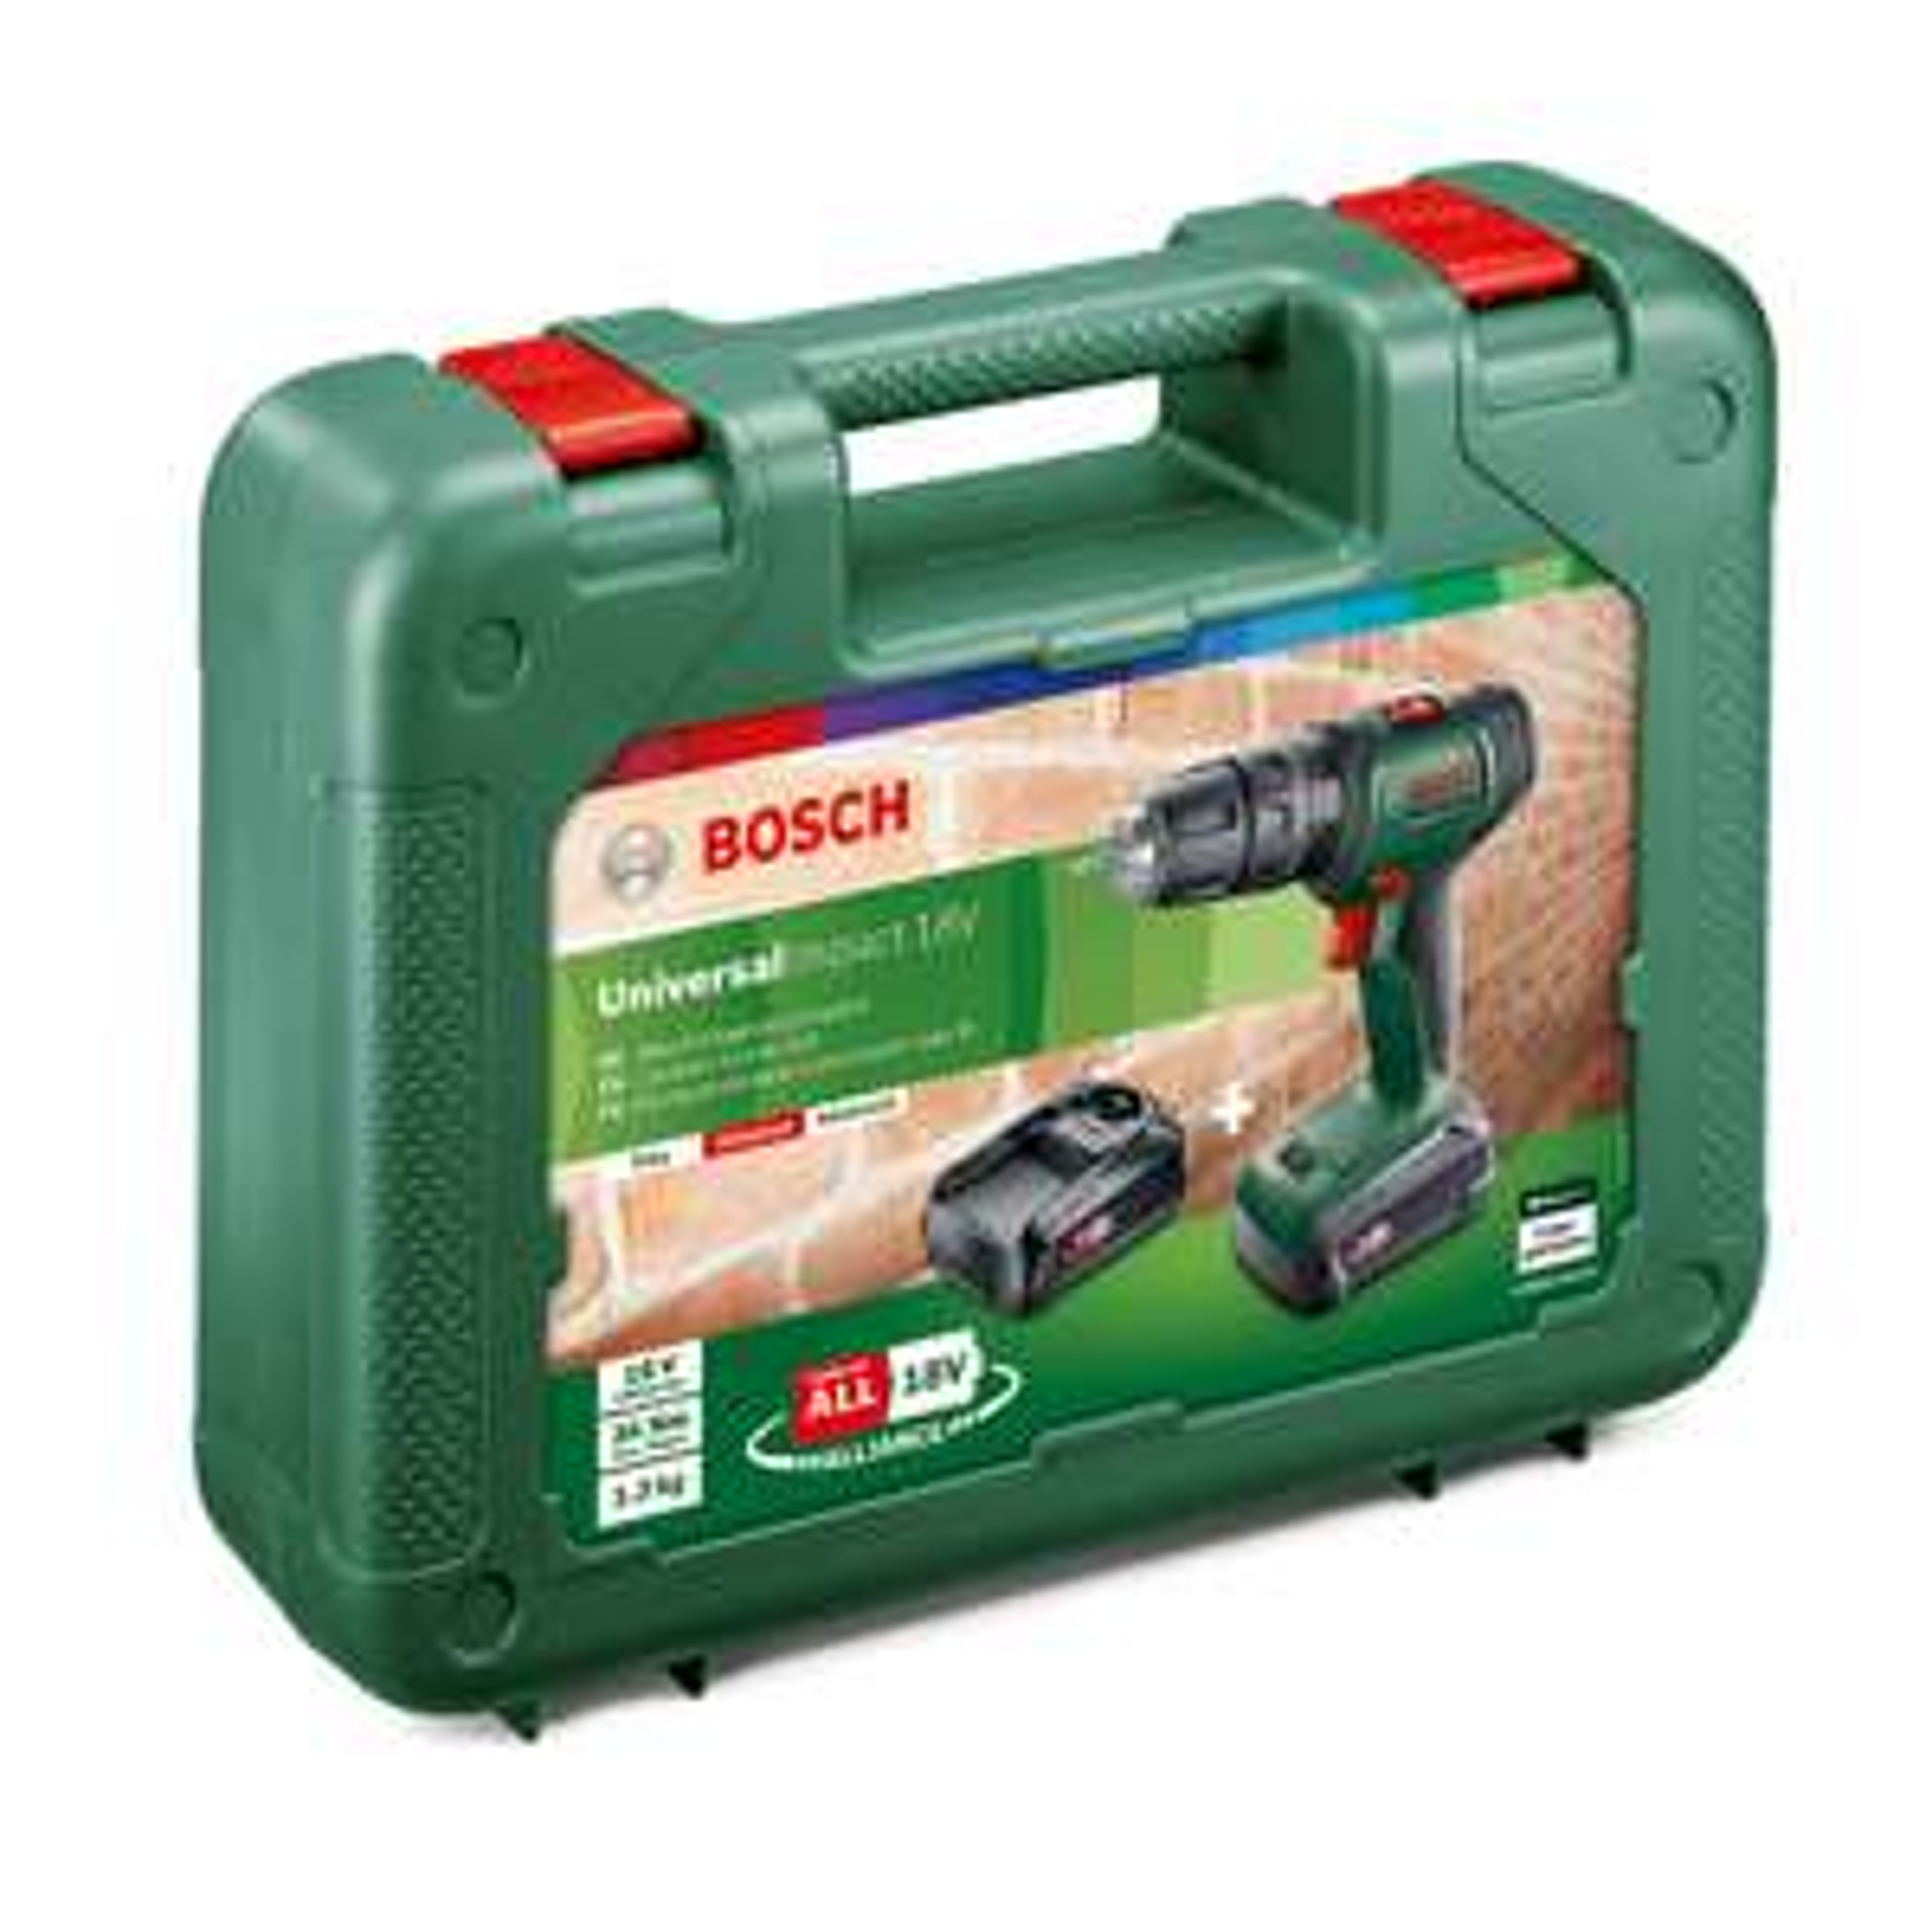 Bosch Universal Impact 18V Cordless Combi Drill with 2 x 2.0Ah Batteries £54 Instore B&Q St. Albans